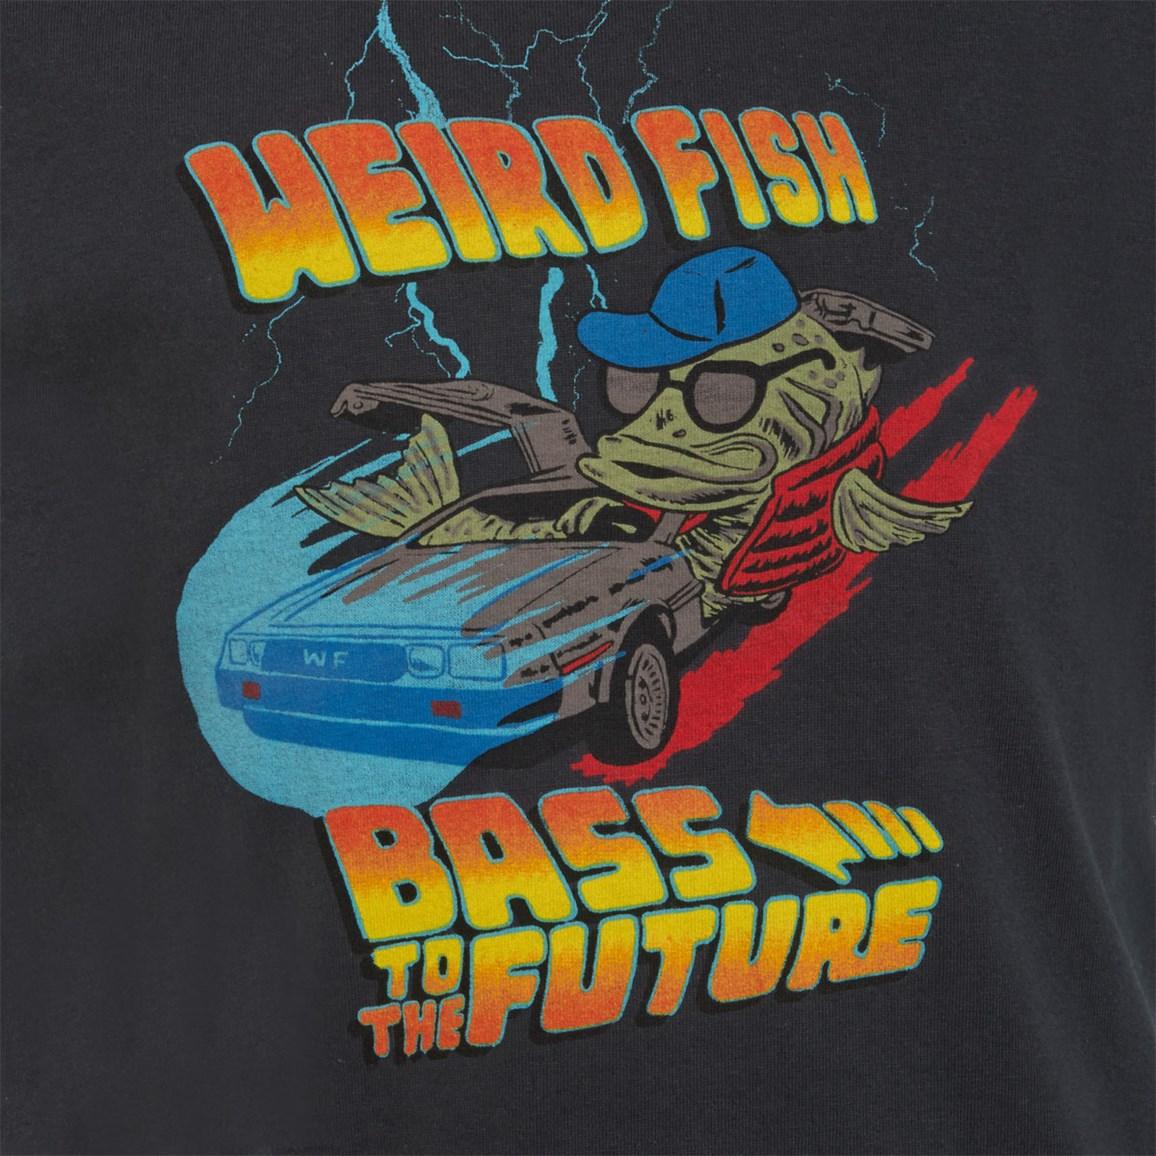 Weird Fish Bass To The Future Artist T-Shirt Charcoal Size 11-12